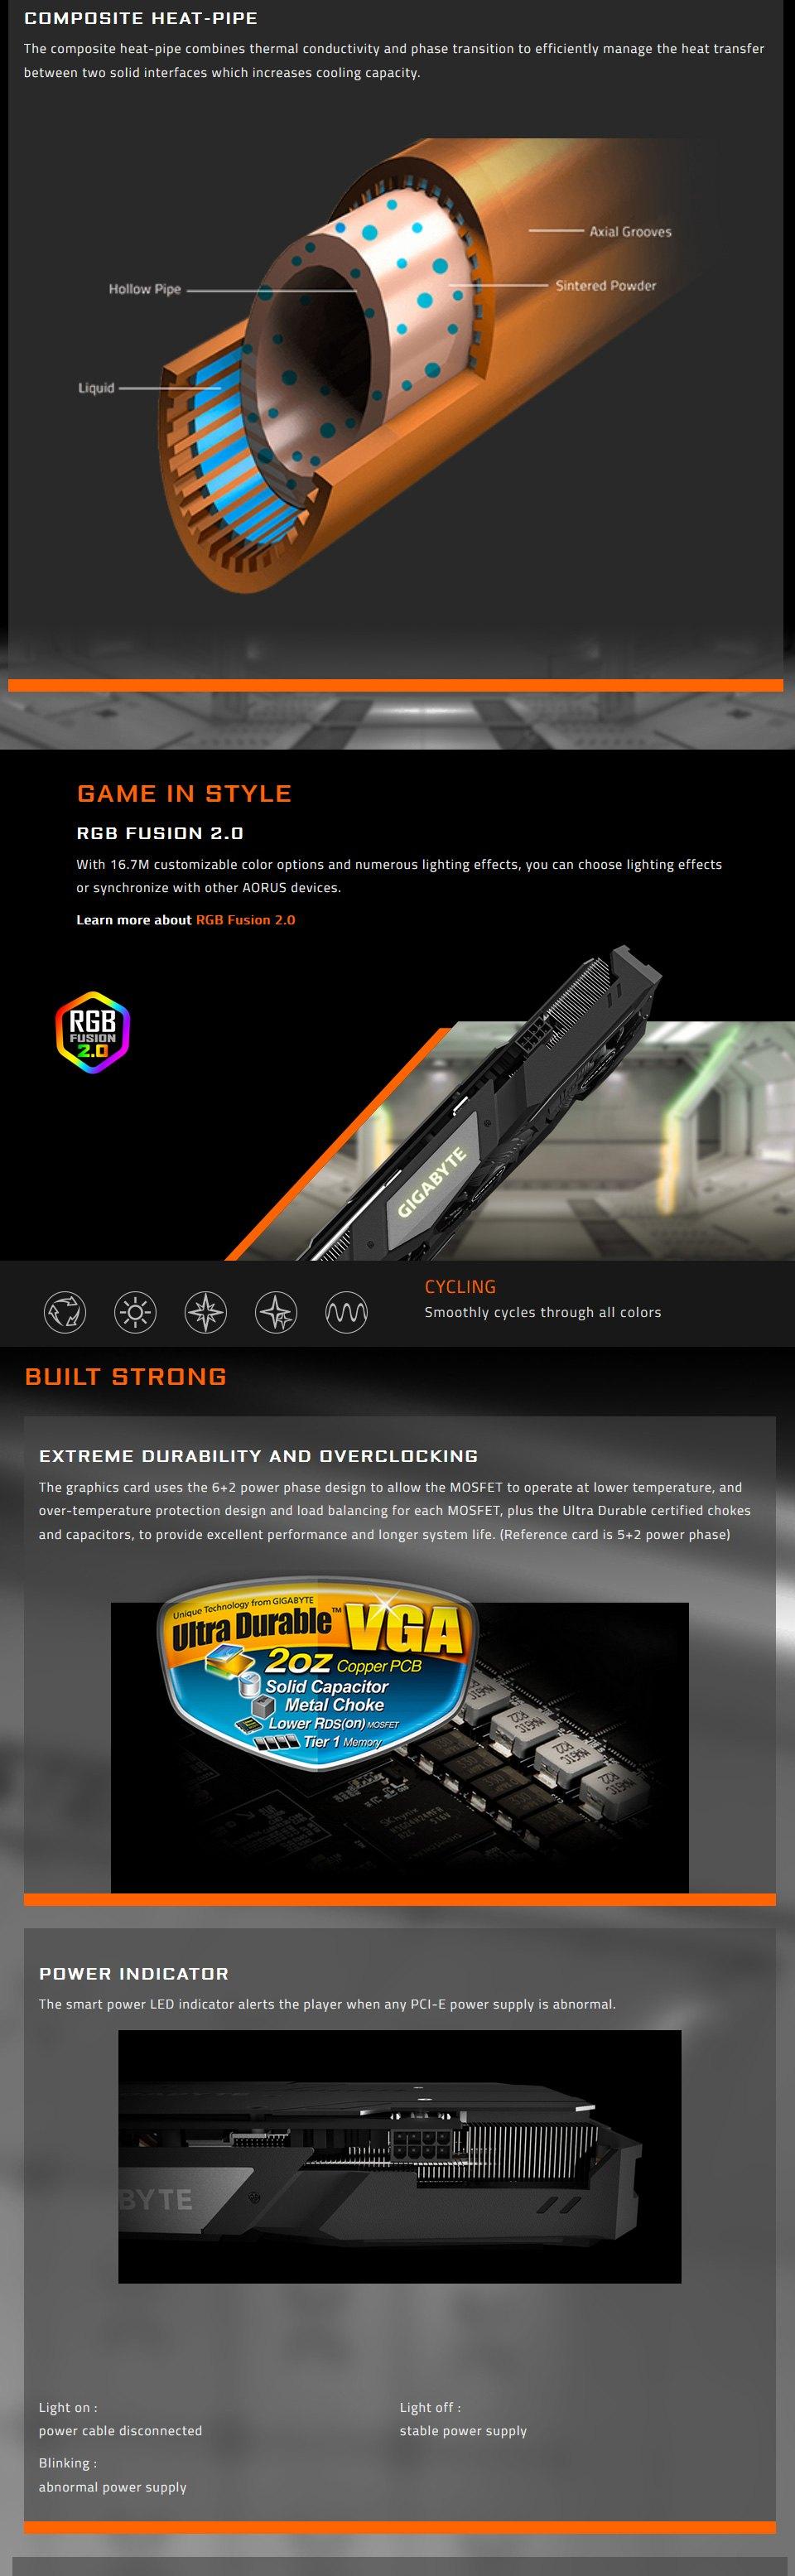 Gigabyte GeForce RTX 2060 Super Gaming OC 3X 8GB features 3